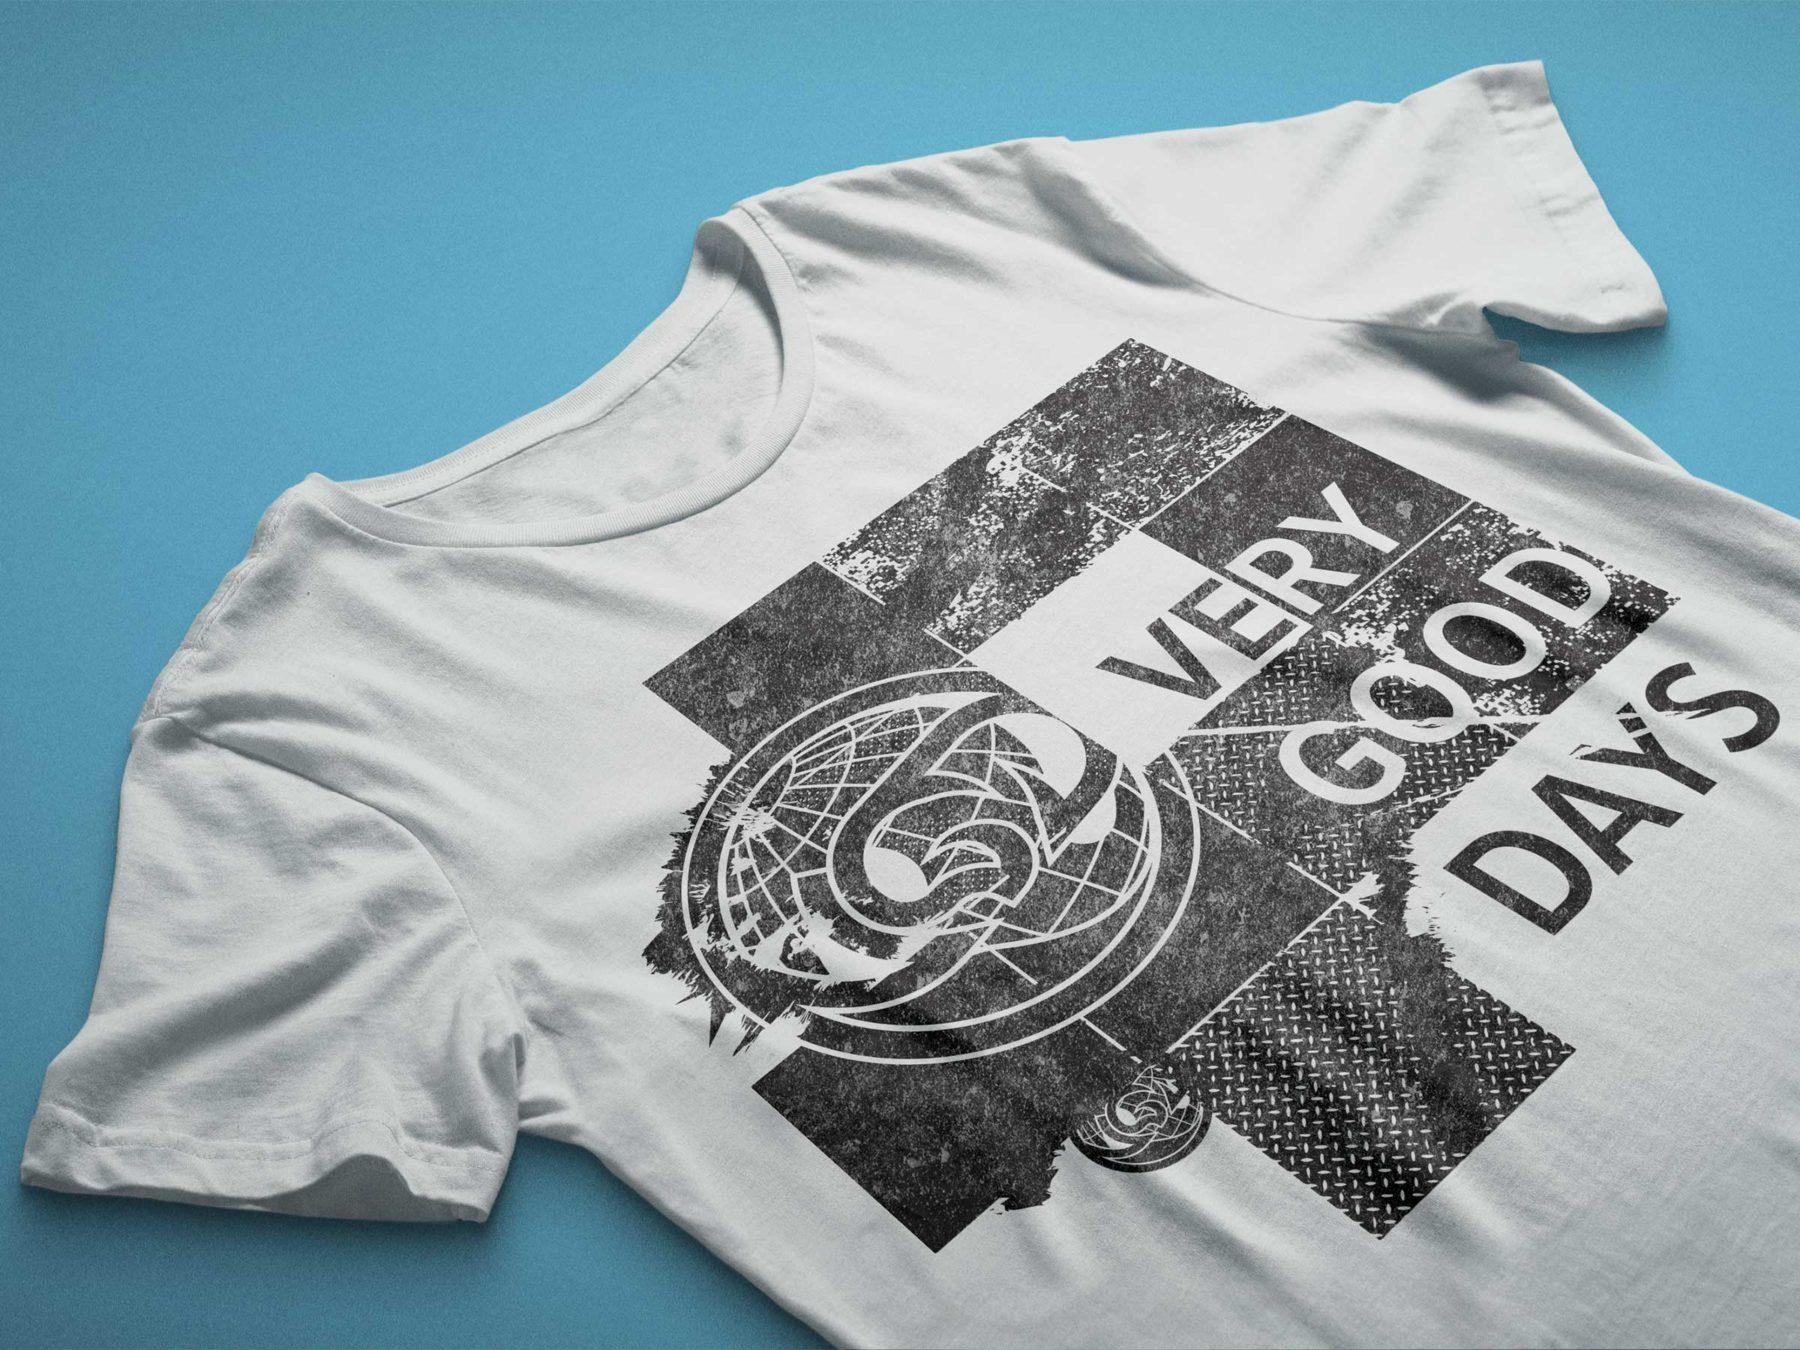 Very Good Days Shirt Design